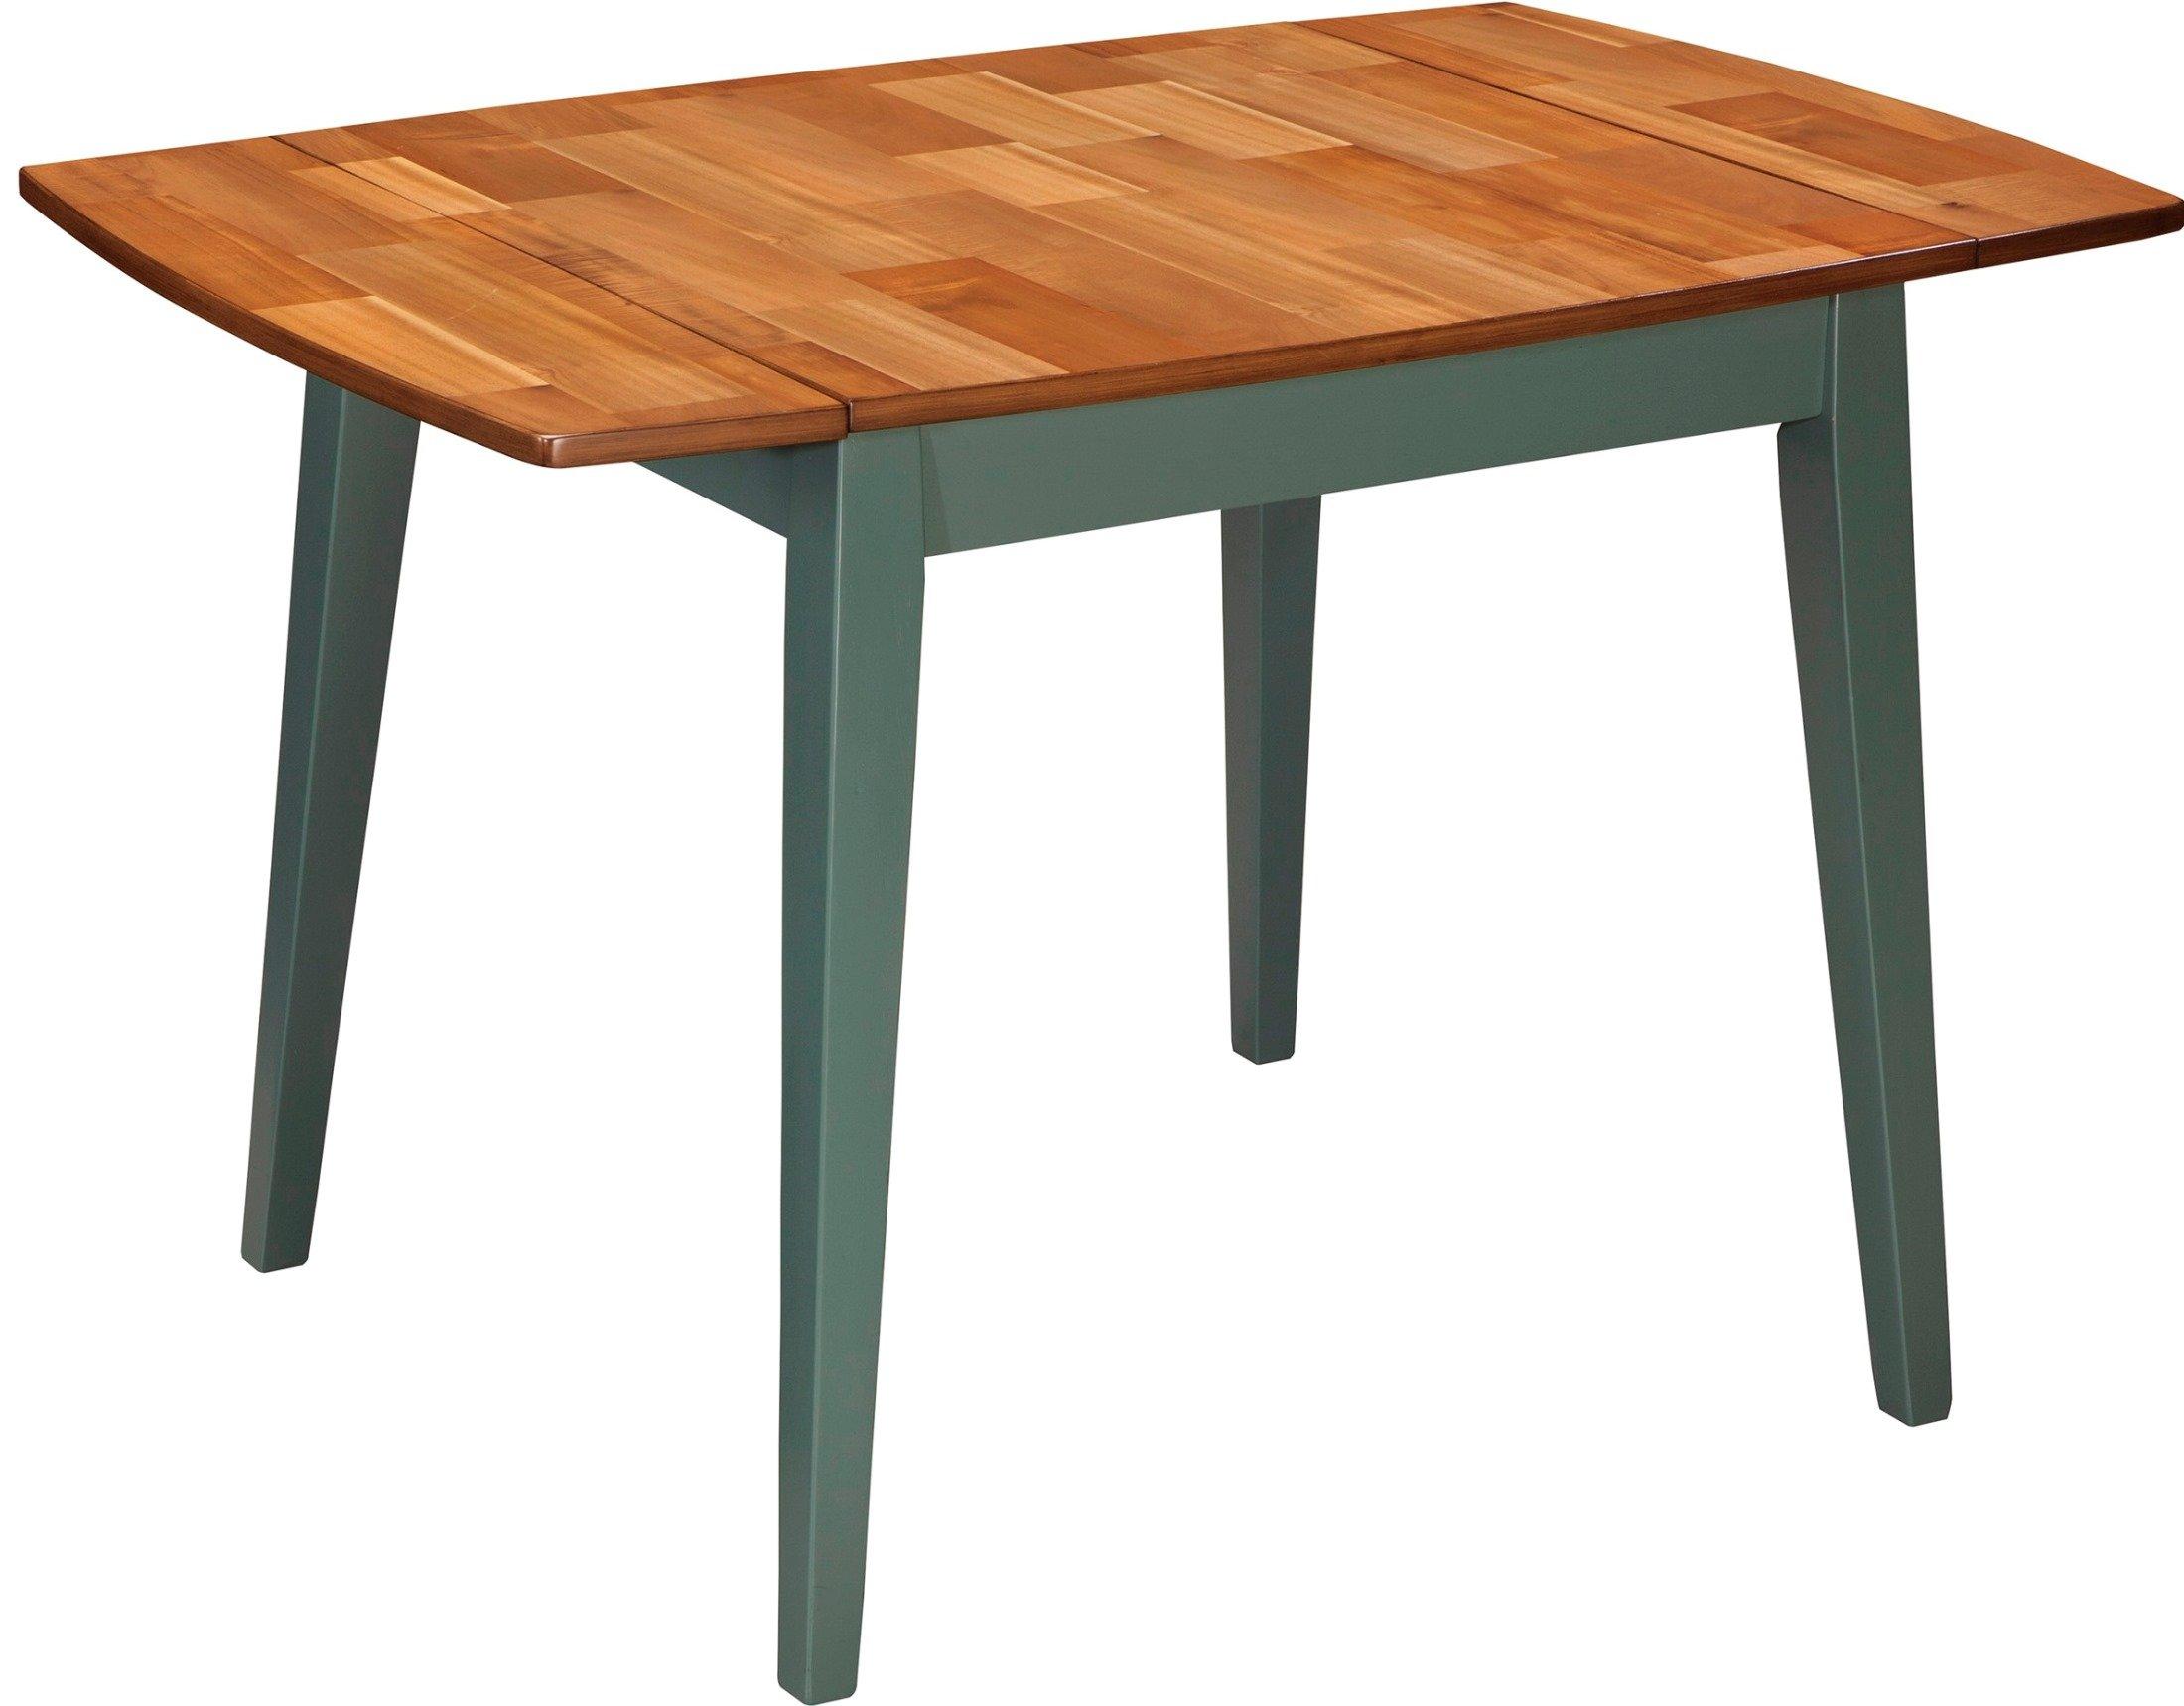 Signature Design by Ashley Bantilly Light Blue Rectangular Dining Room Drop Leaf Table -  - kitchen-dining-room-furniture, kitchen-dining-room, kitchen-dining-room-tables - 71FNclGYA%2BL -